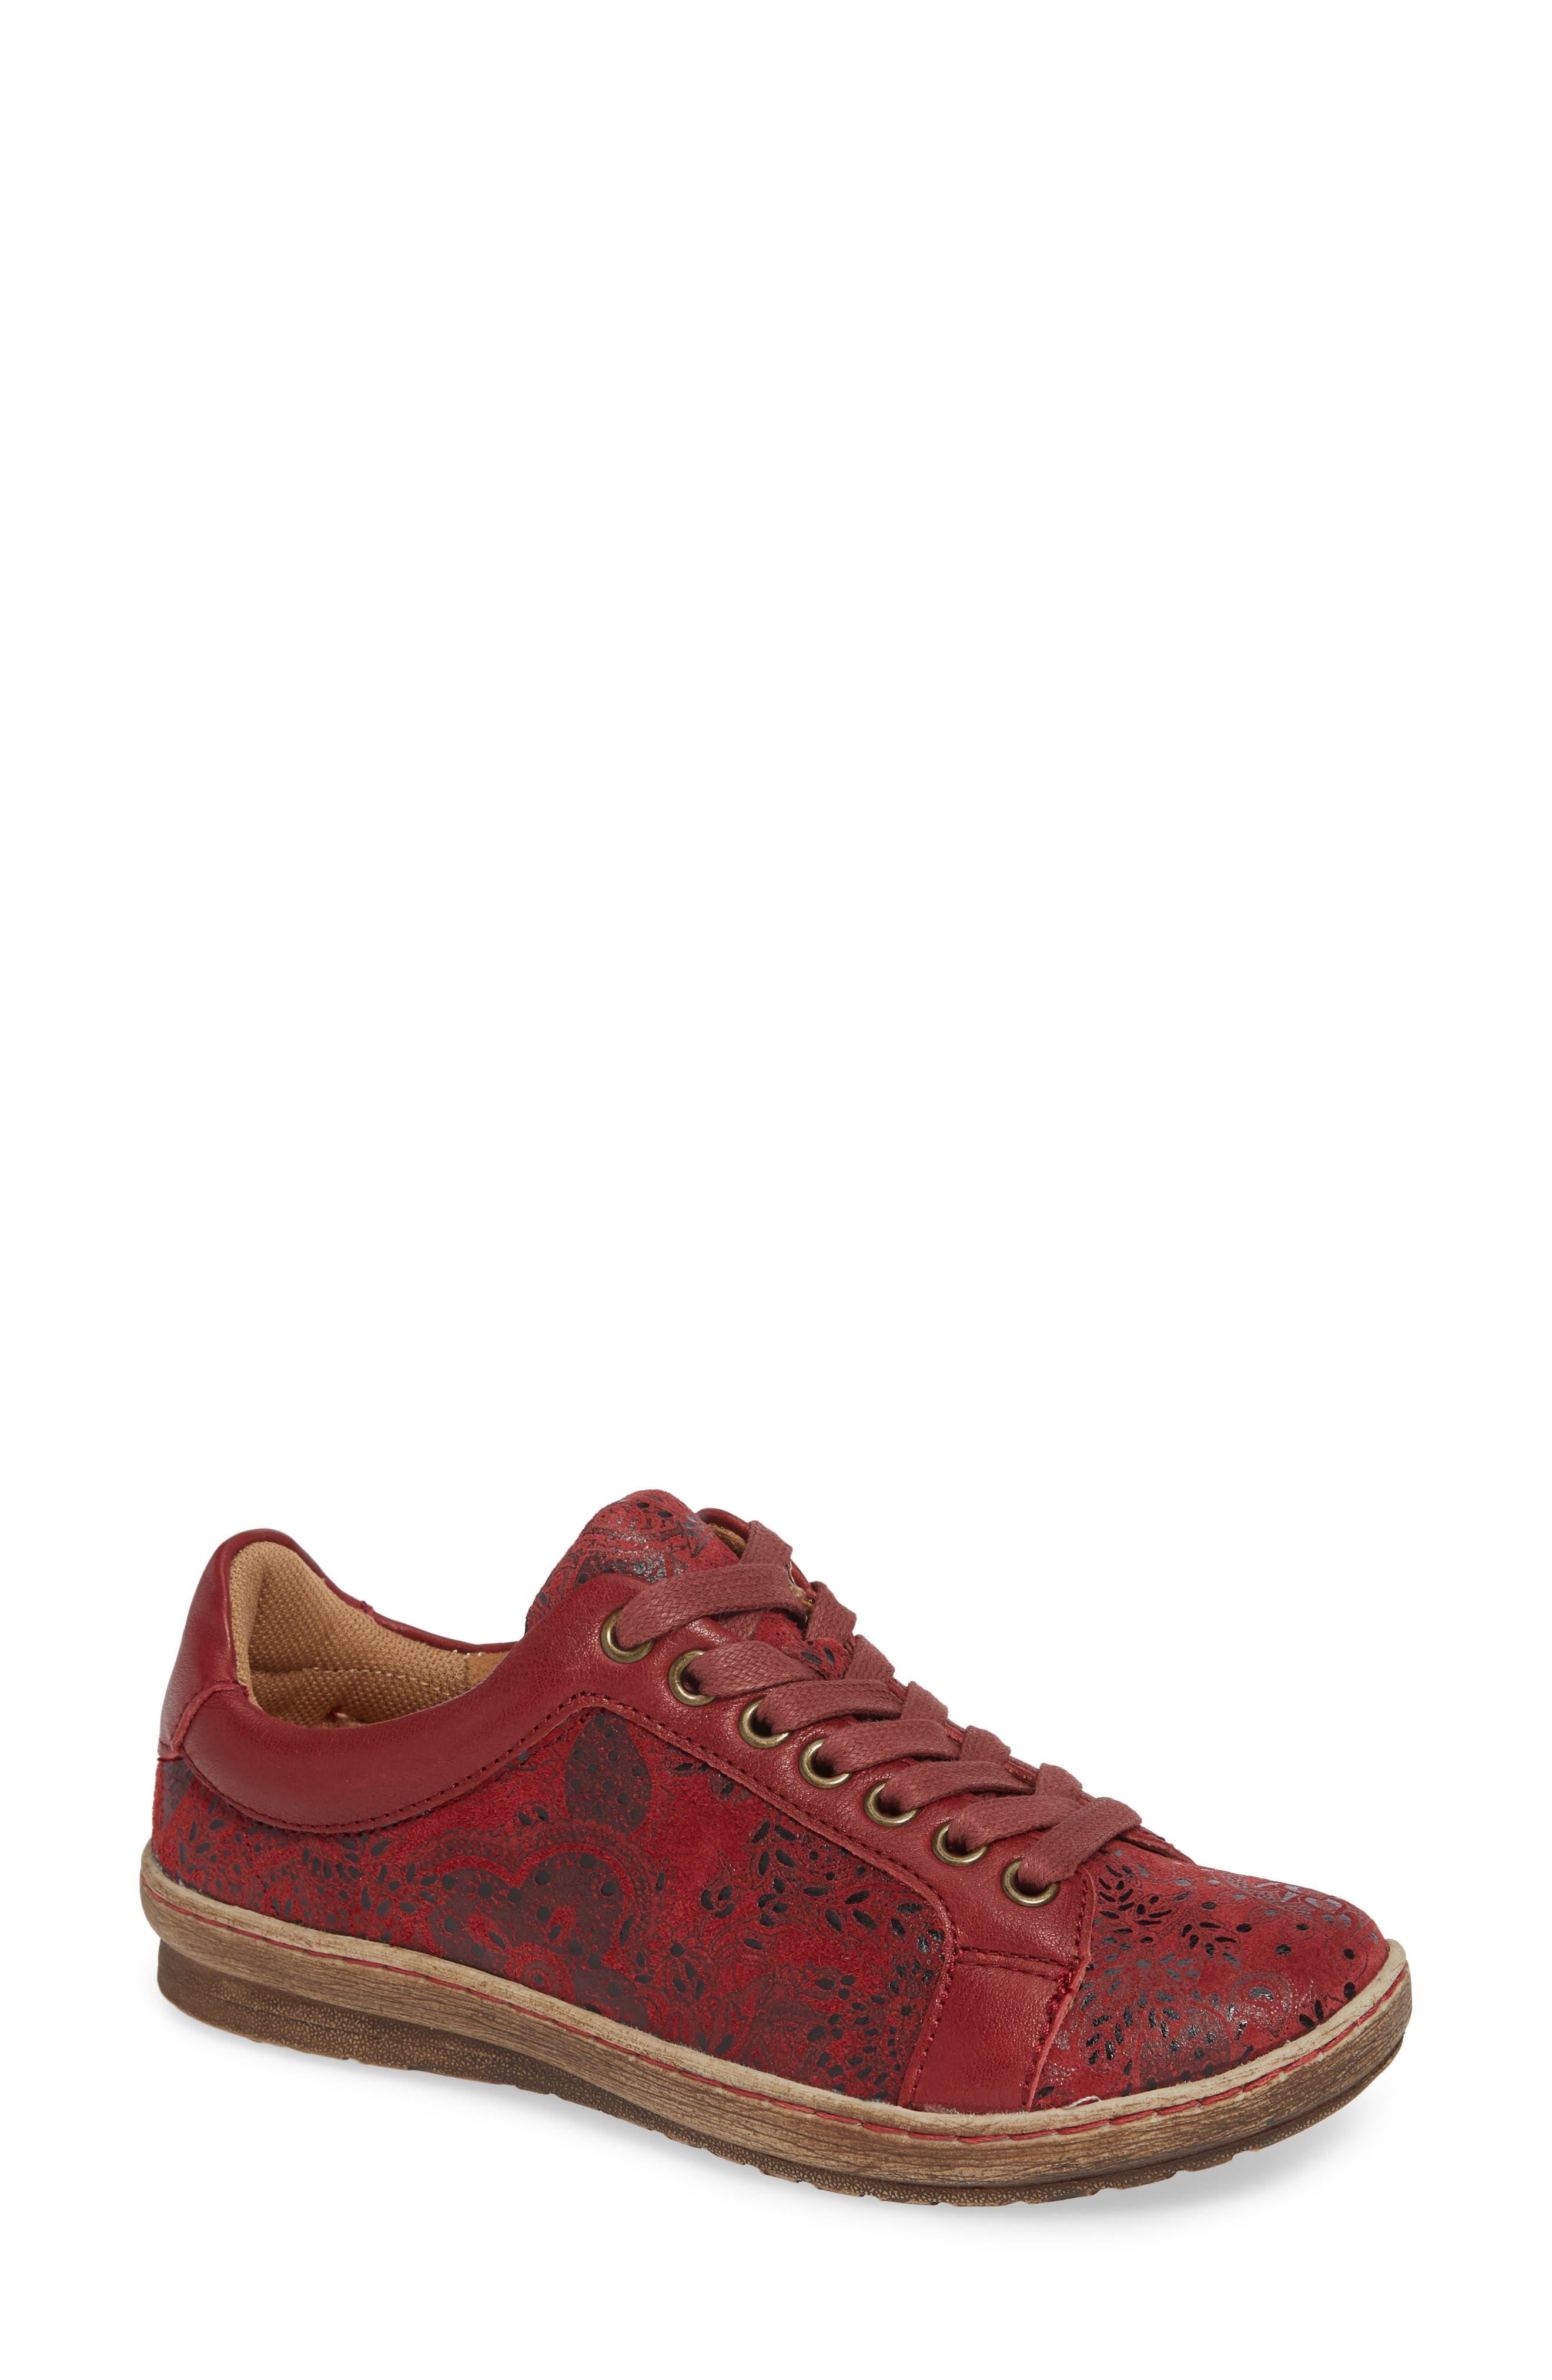 7dc90f745c05 Comfortiva Caledonia Sneaker W - Red